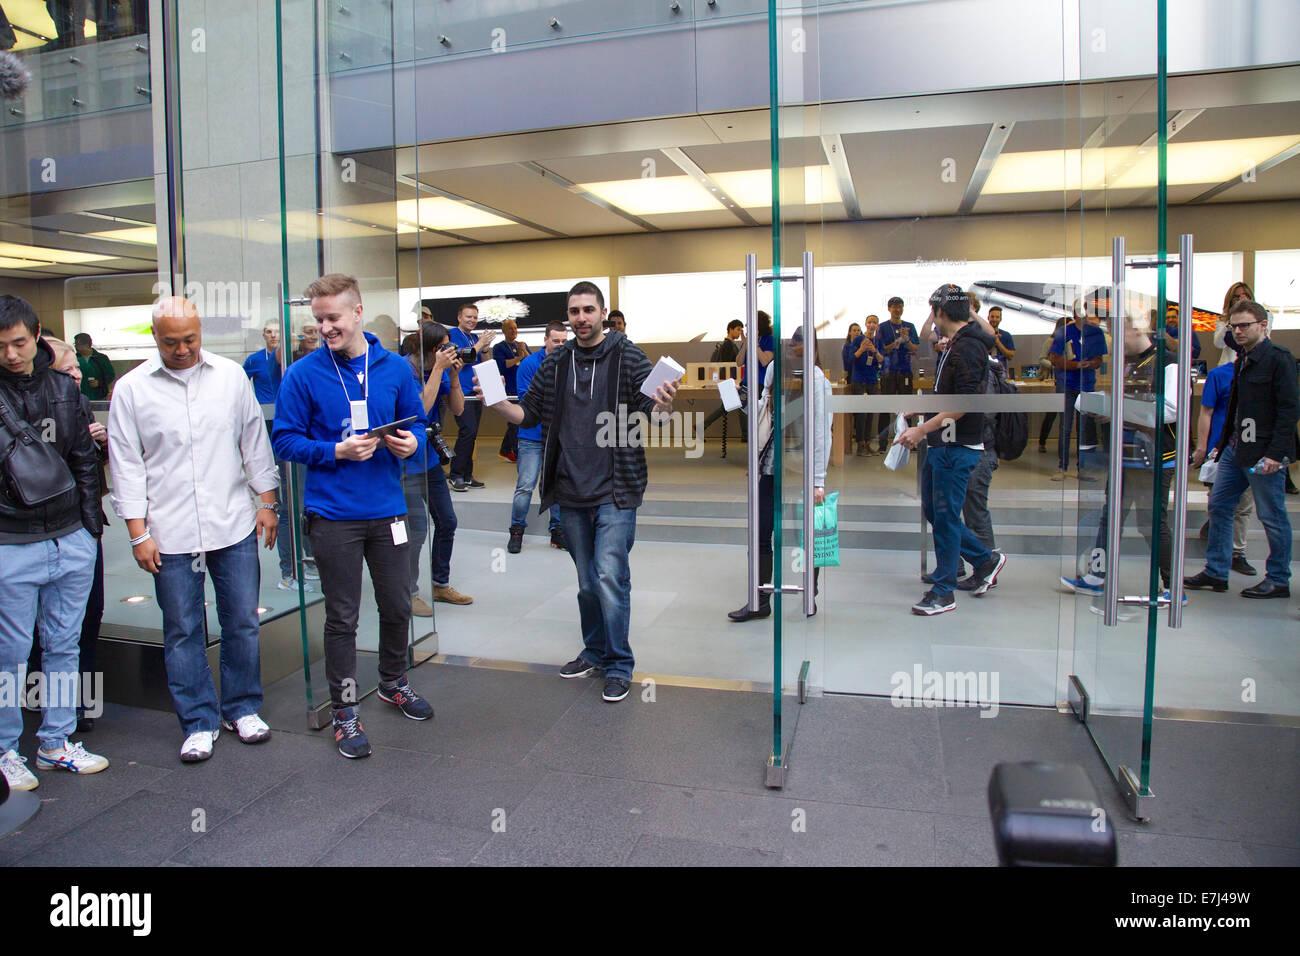 Sydney, Australia. 19th Sep, 2014. David Rahimi editor-in-chief at PhoneBuff.com from Laguna Hills, California is Stock Photo